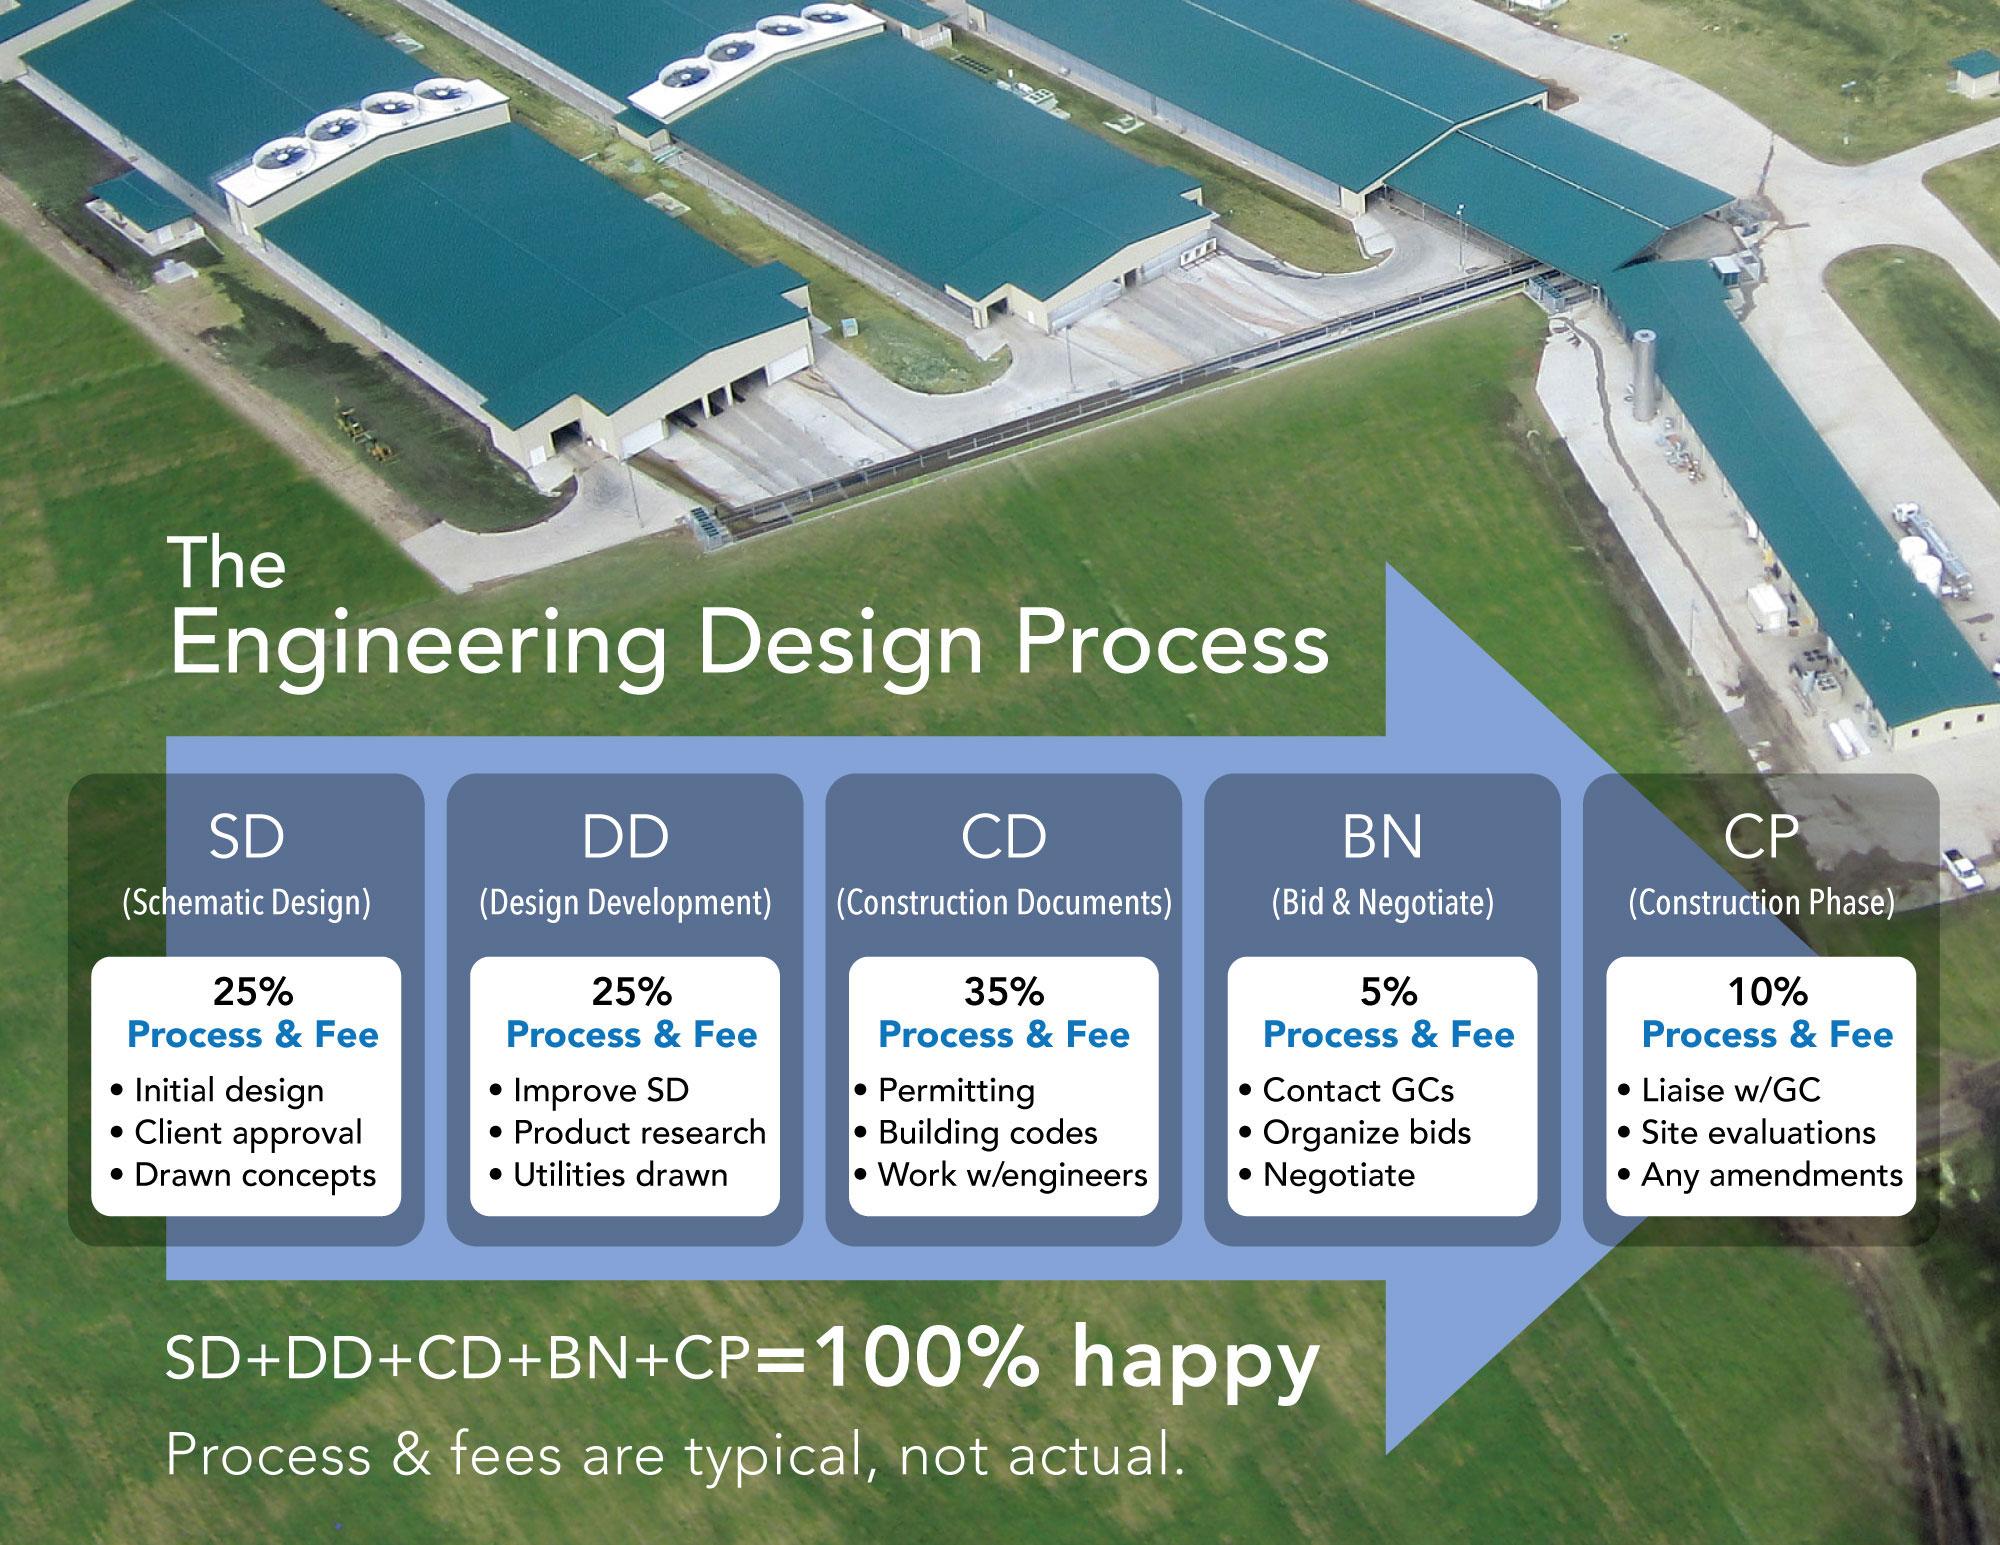 Engineering Design Process Graphic